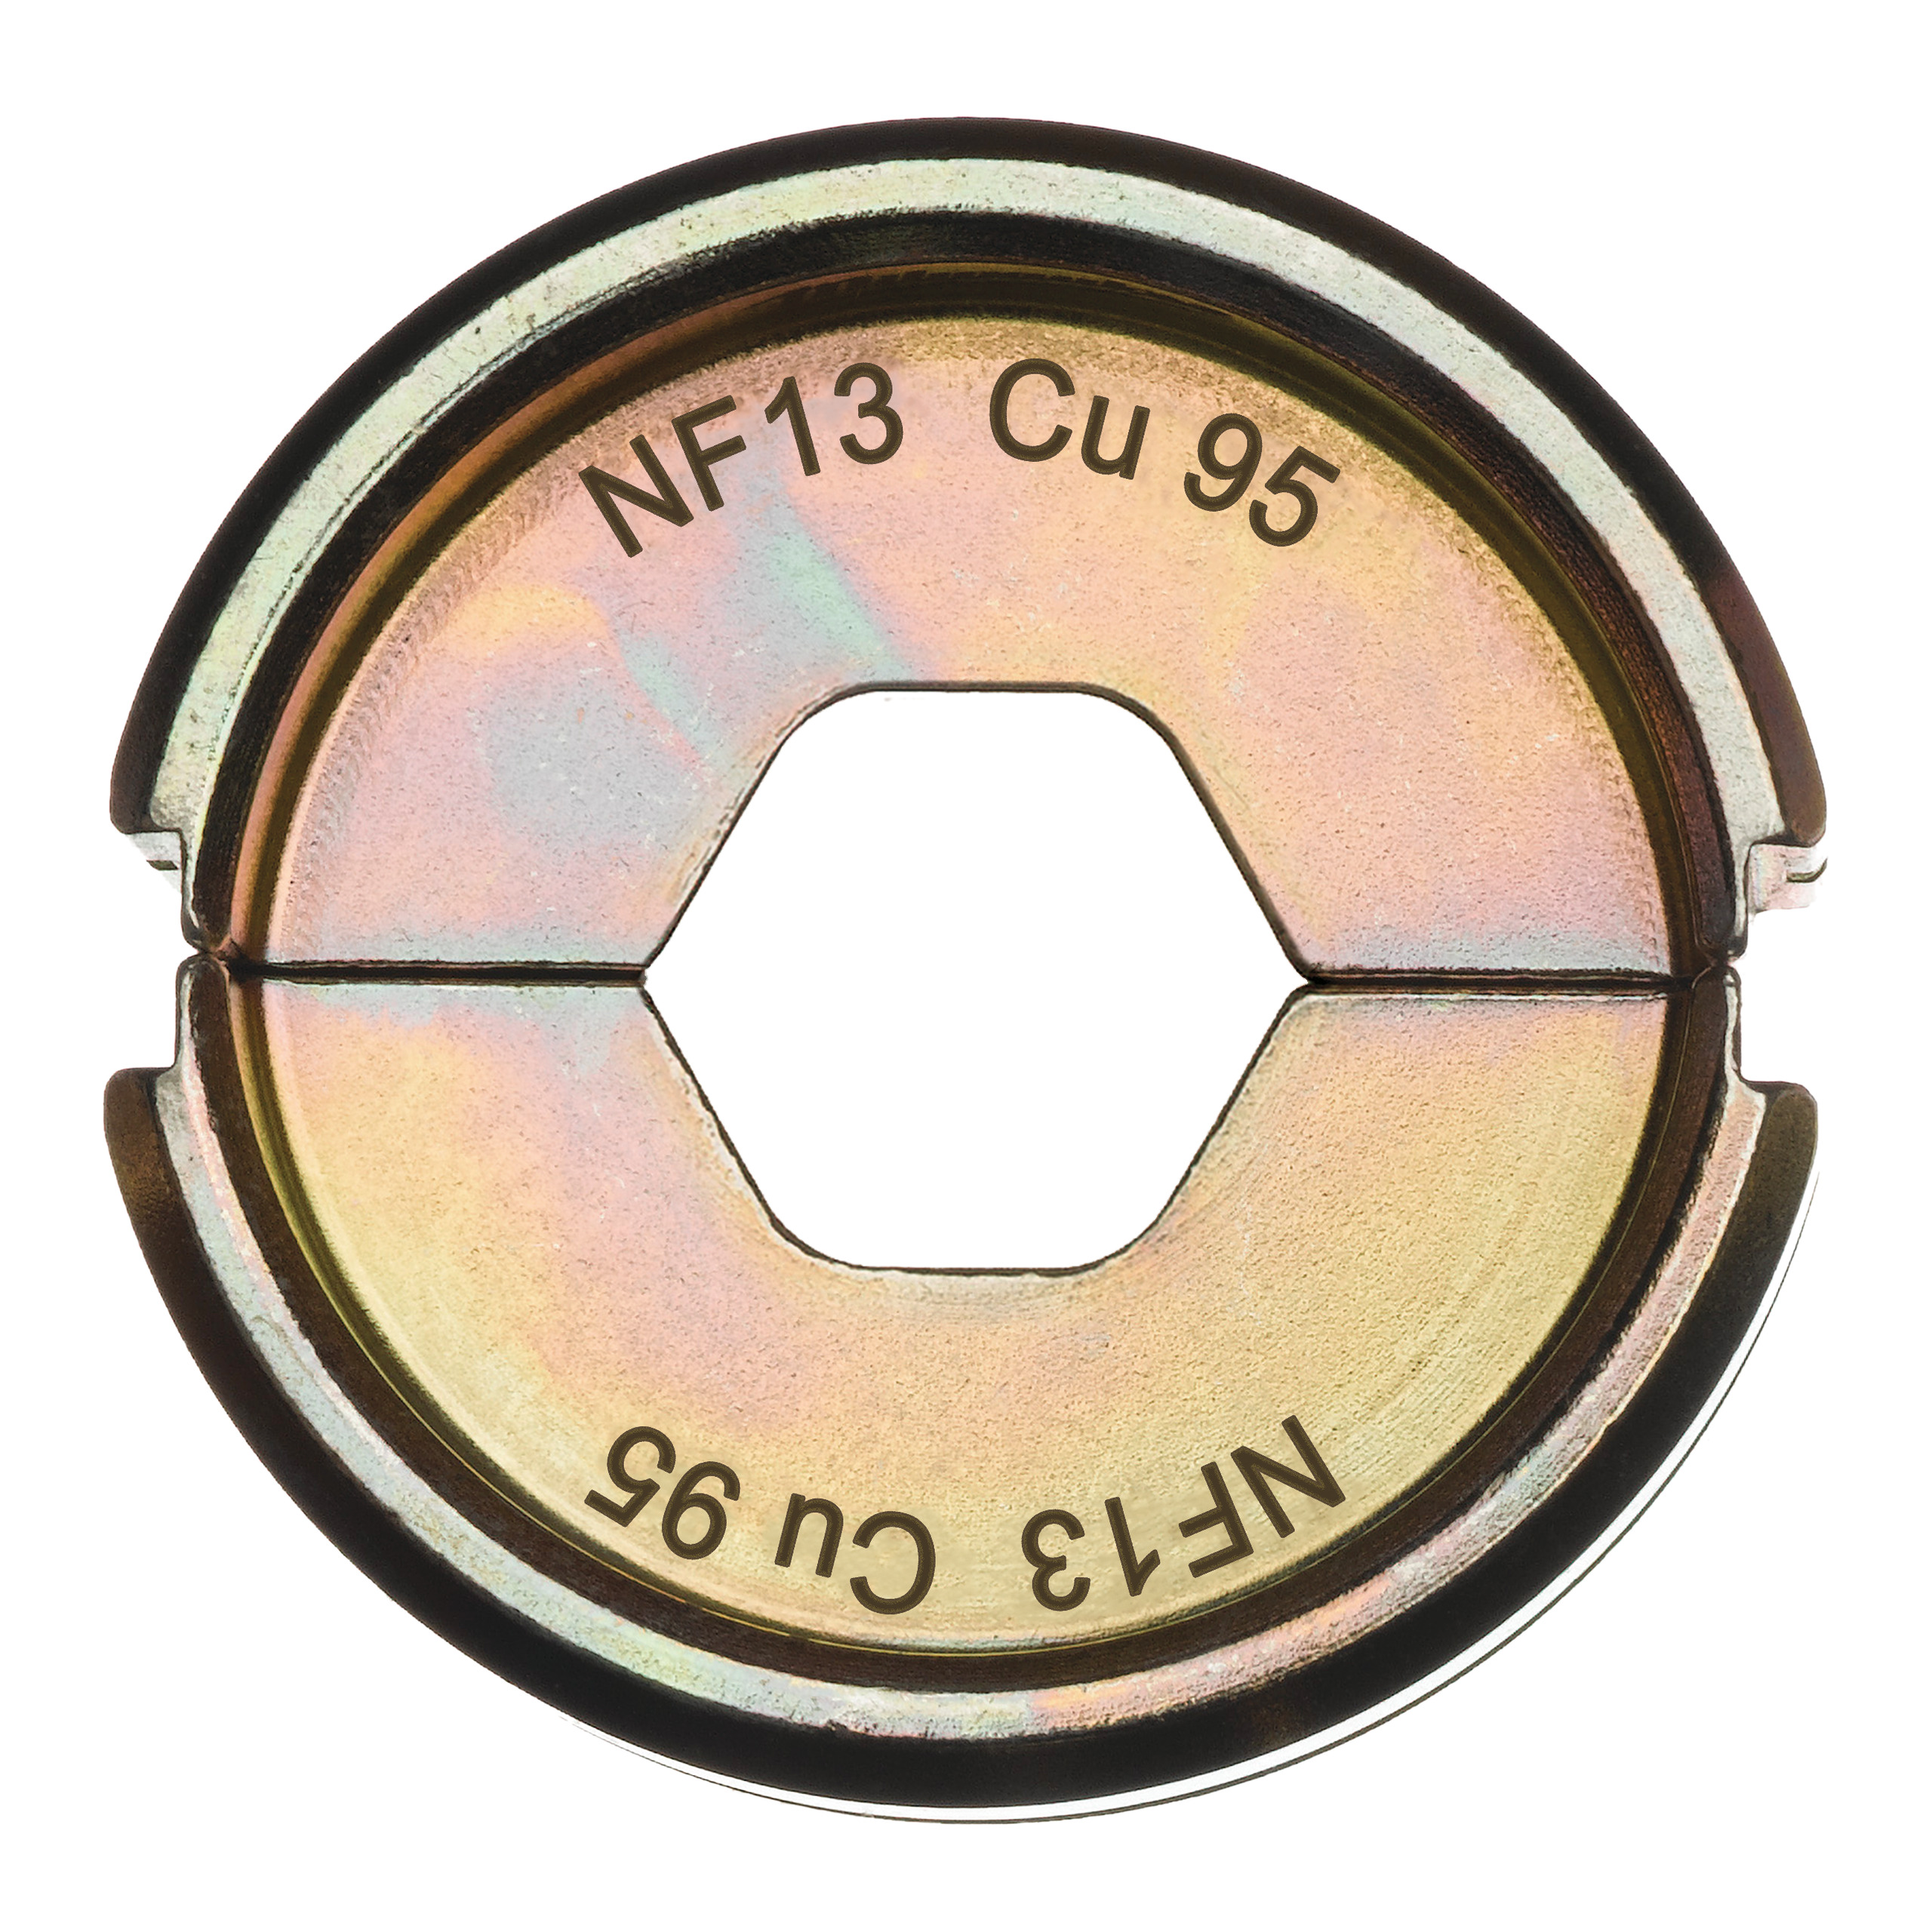 NF13 CU 95-1PC Pojistný kroužek